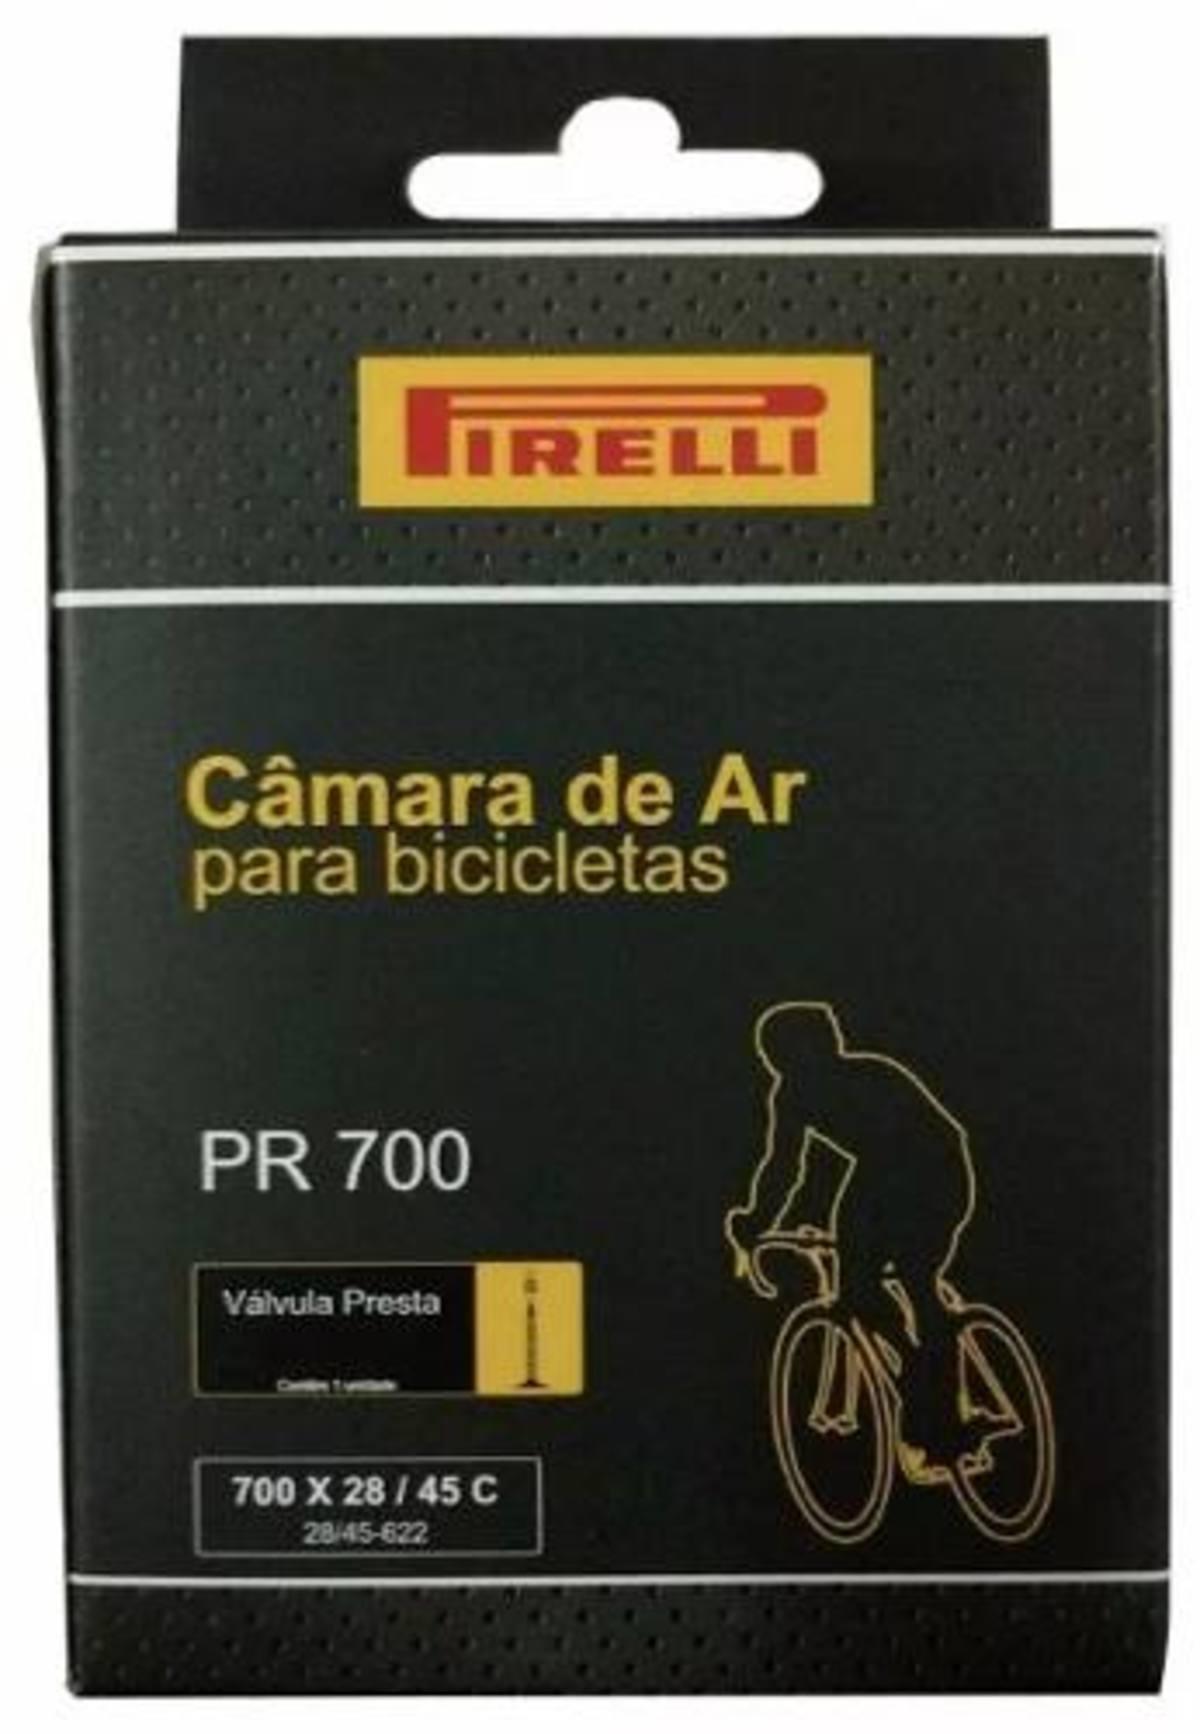 Pneu Pirelli Tornado Aramado 700x23 com Camara Pirelli 700 Kit